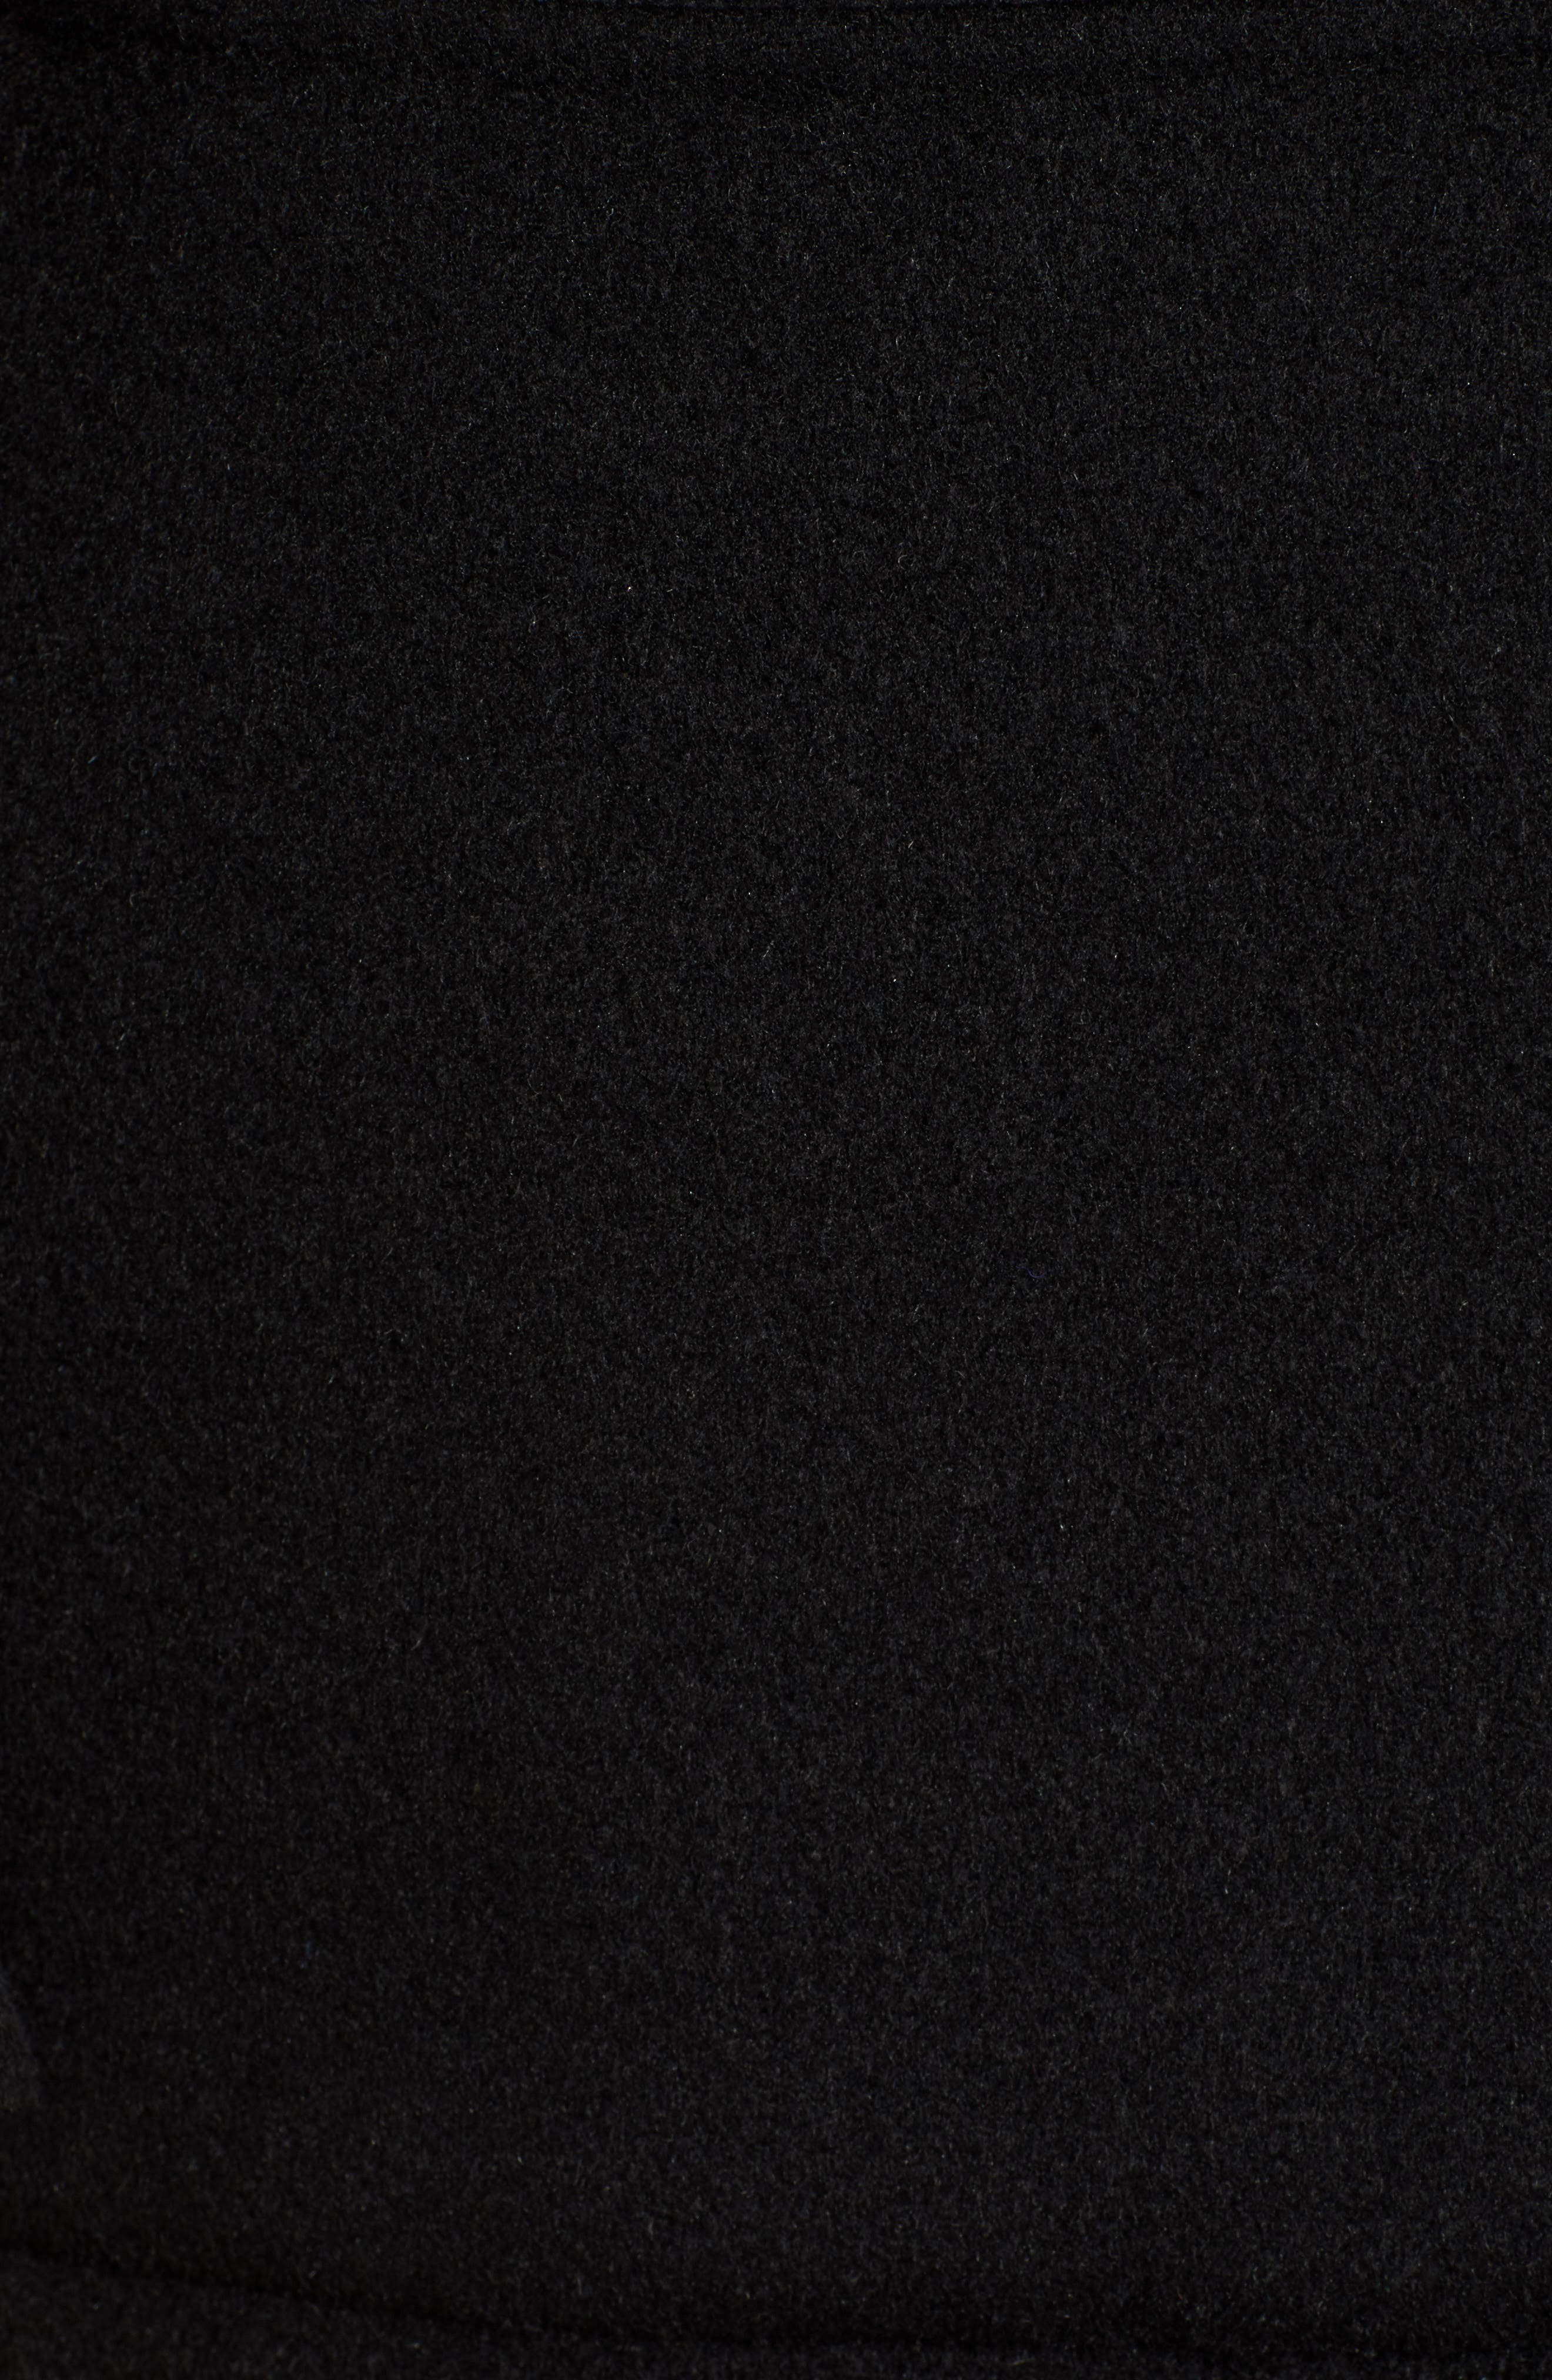 Jenn Double Face Wool Blend Reversible Coat,                             Alternate thumbnail 7, color,                             016